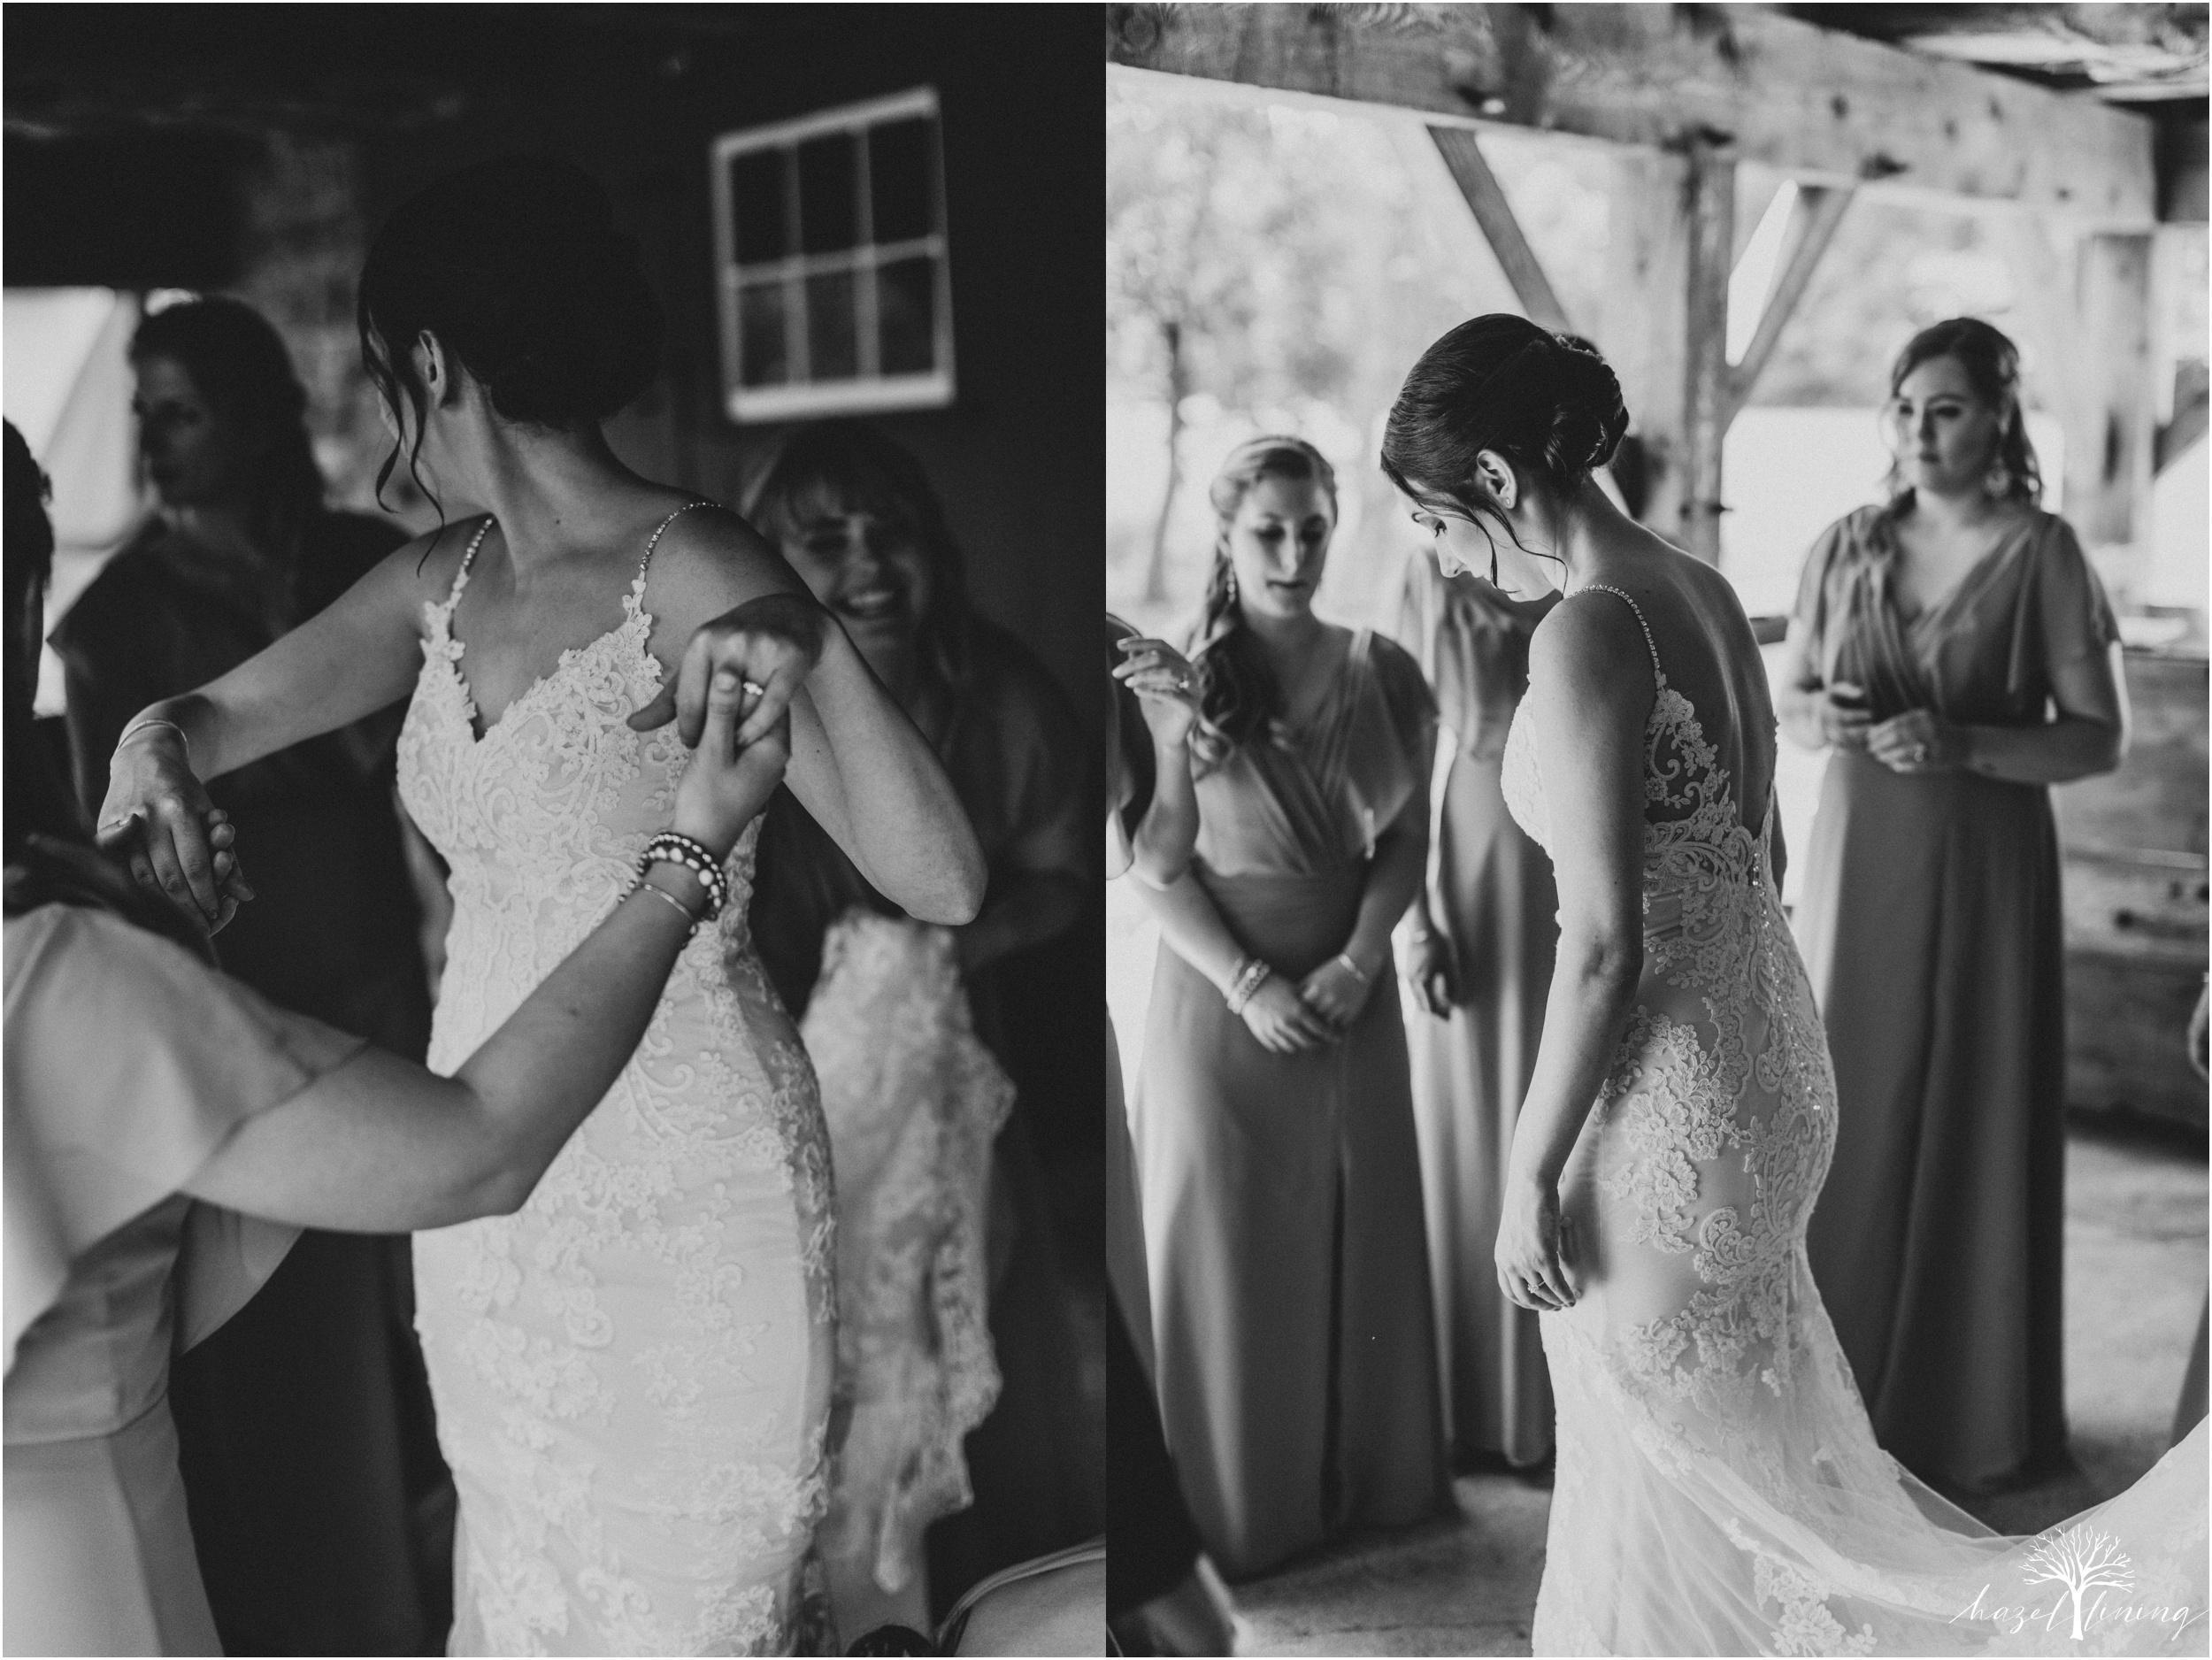 hazel-lining-travel-wedding-elopement-photography-lisa-landon-shoemaker-the-farm-bakery-and-events-bucks-county-quakertown-pennsylvania-summer-country-outdoor-farm-wedding_0013.jpg